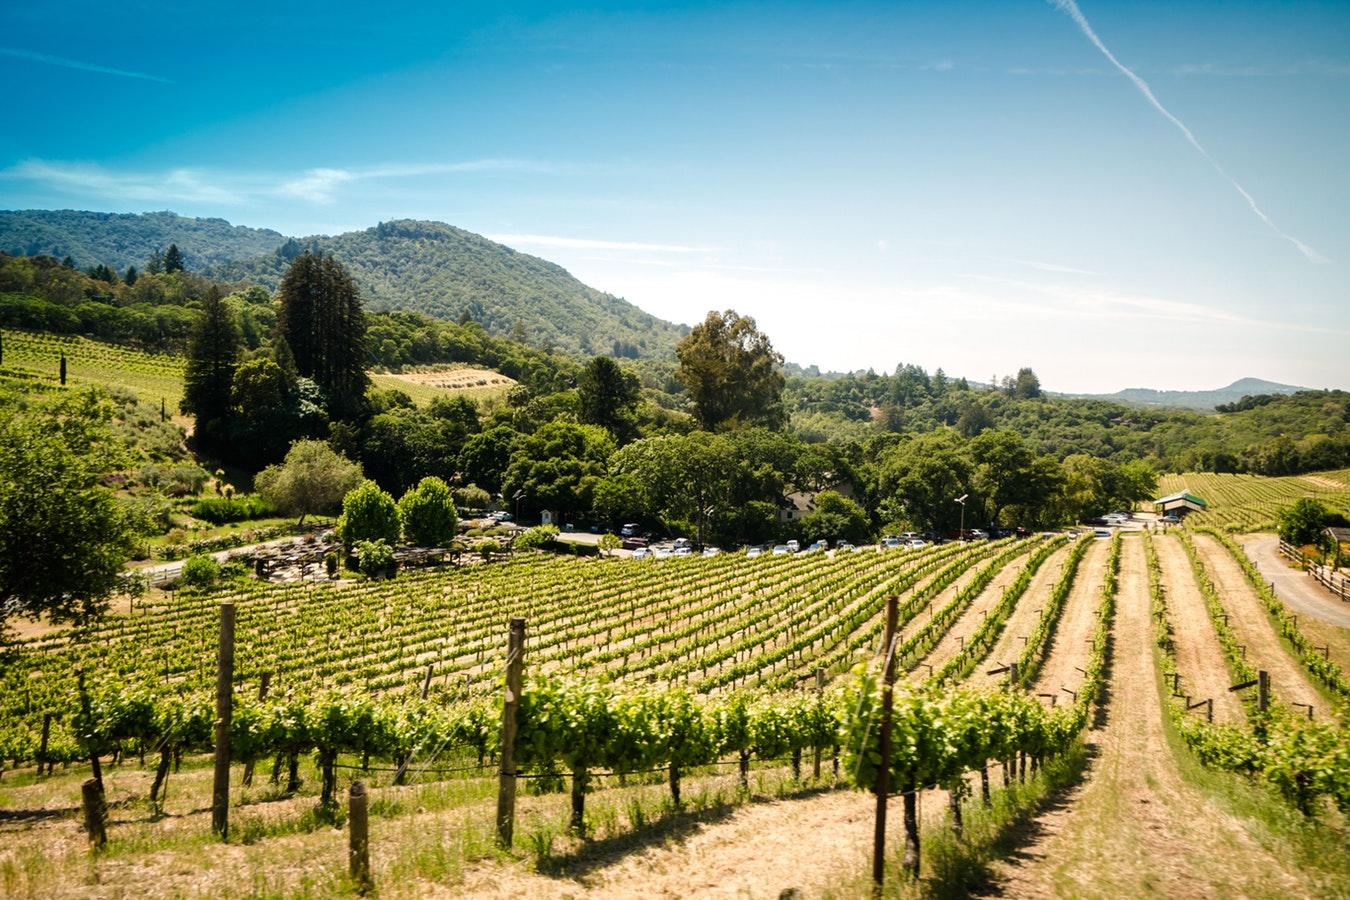 Enjoy a Vineyard Tour in Tuscany